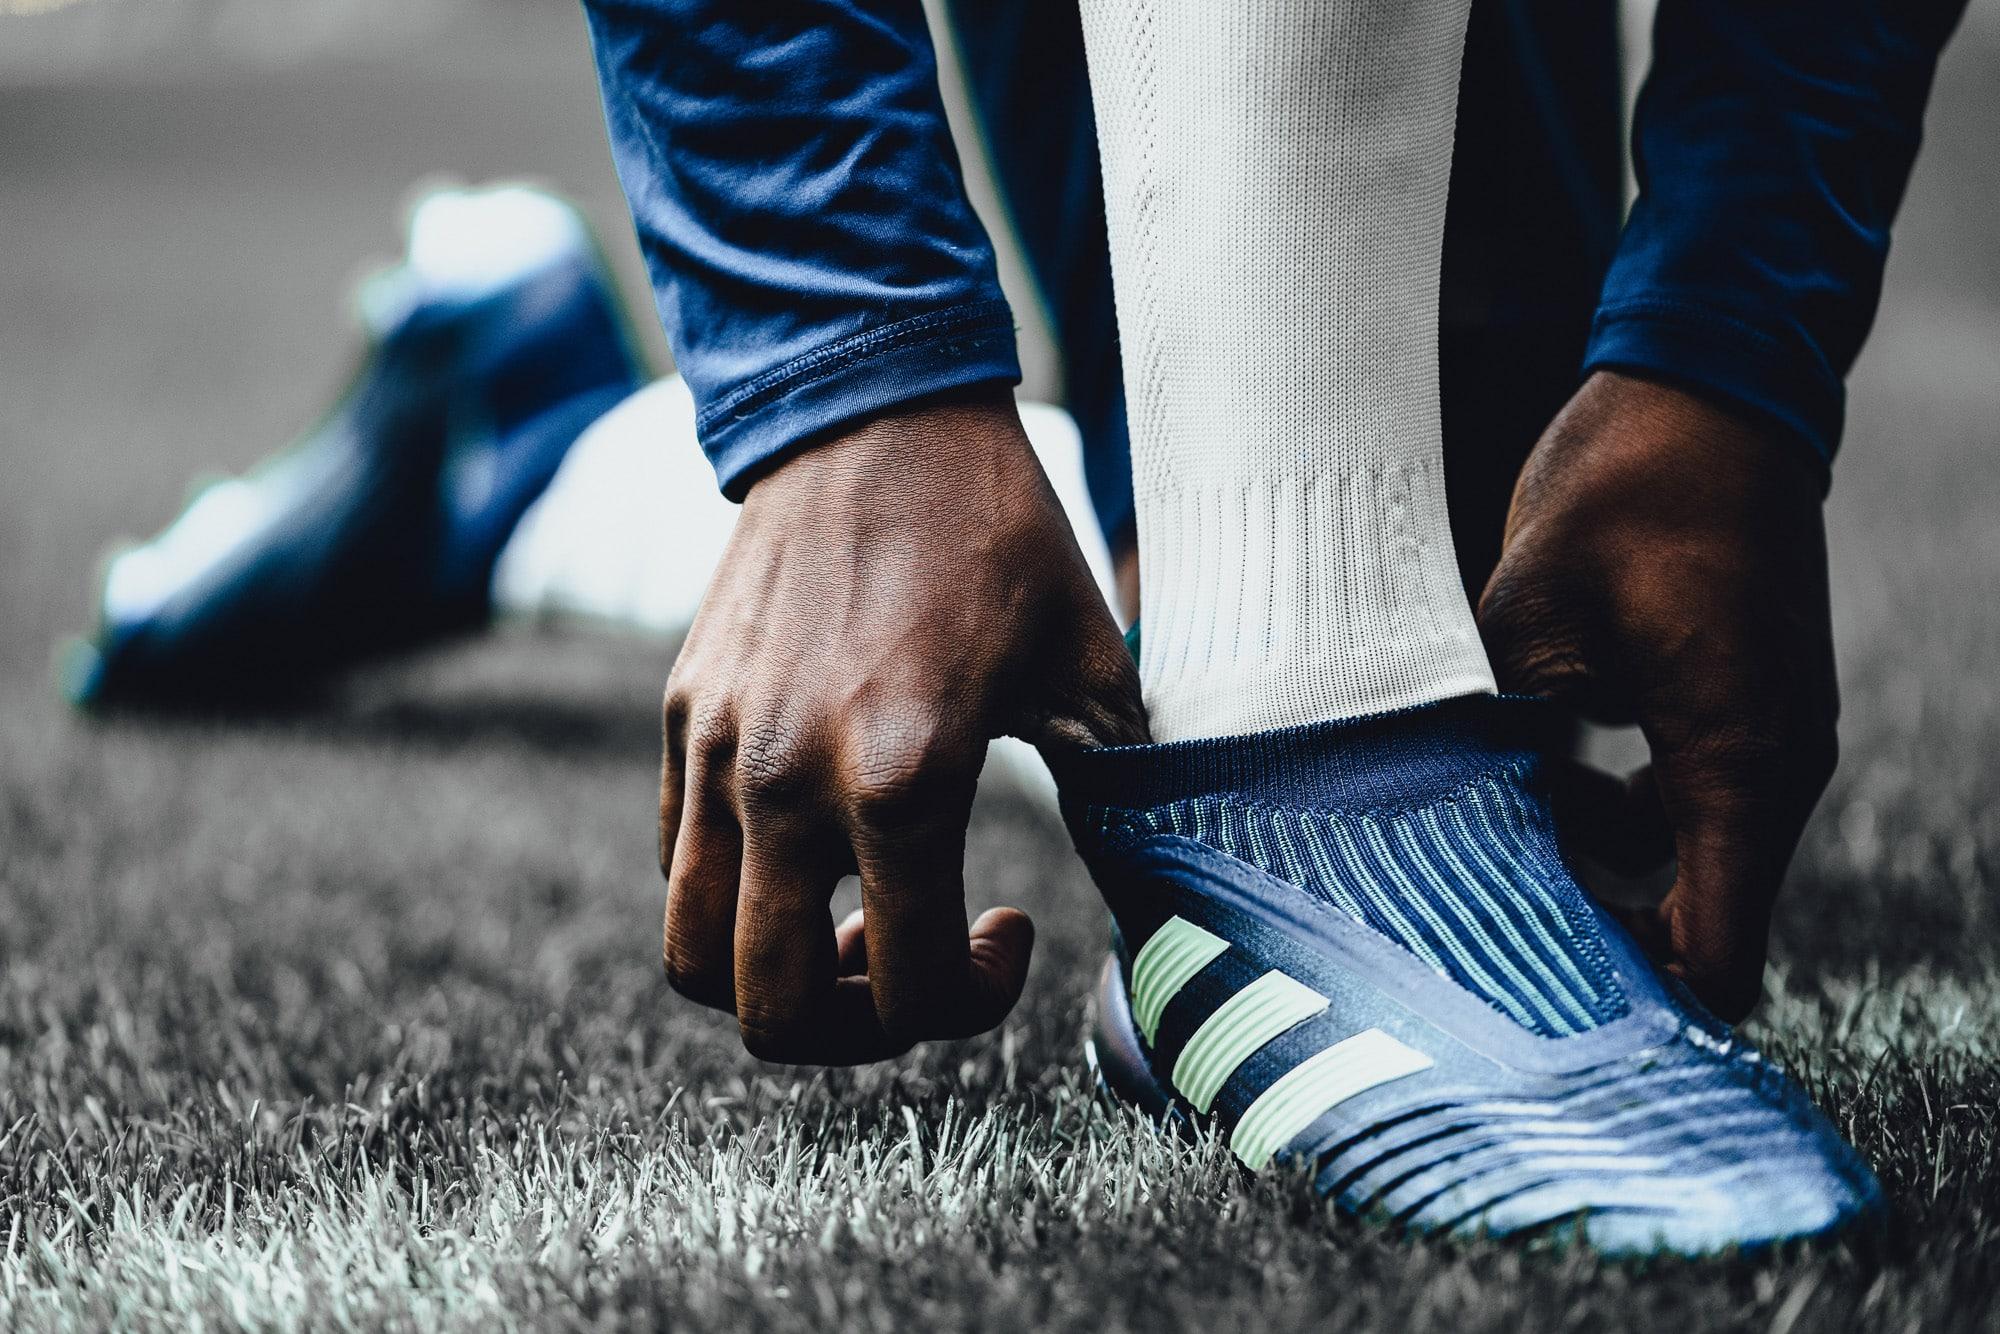 chaussure-football-adidas-predator-deadly-strike-mars-2018-2